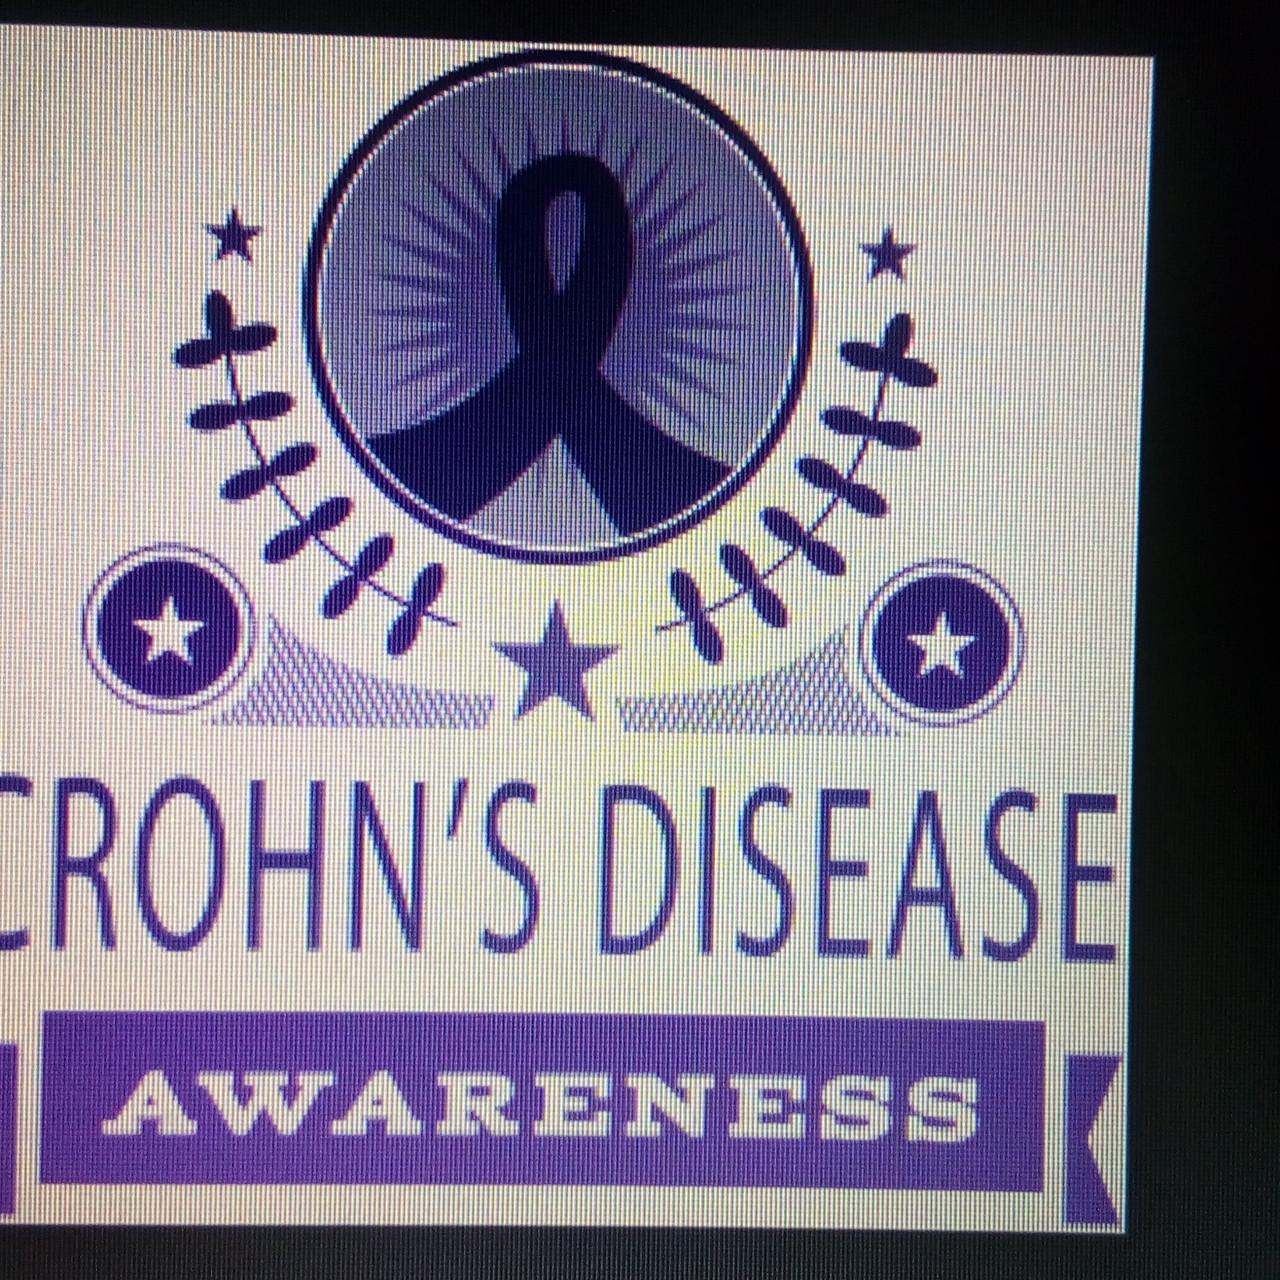 crohns awareness symbol